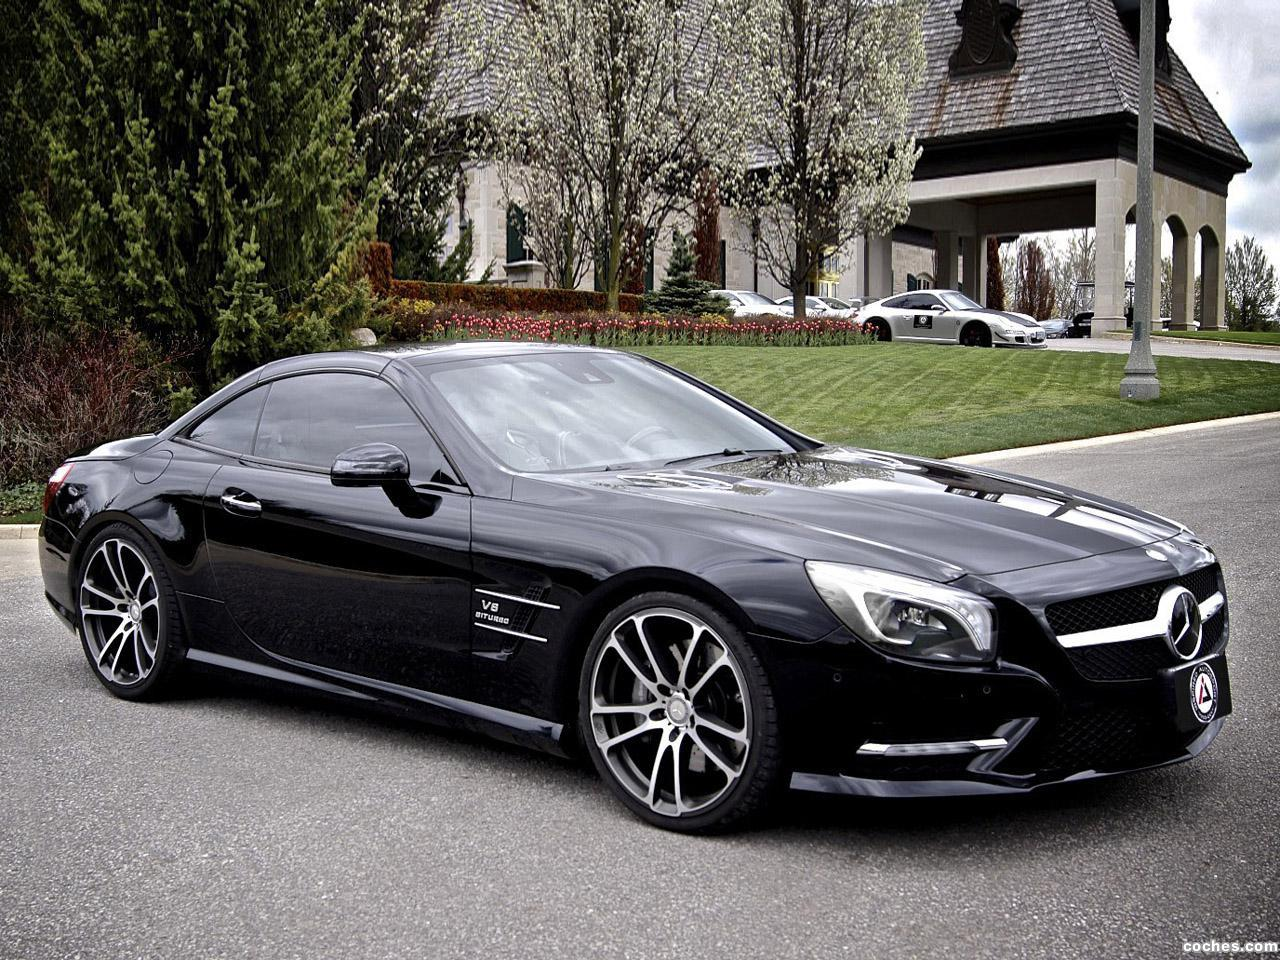 Foto 0 de Brabus Mercedes SL550 by Inspired Autosport 2014